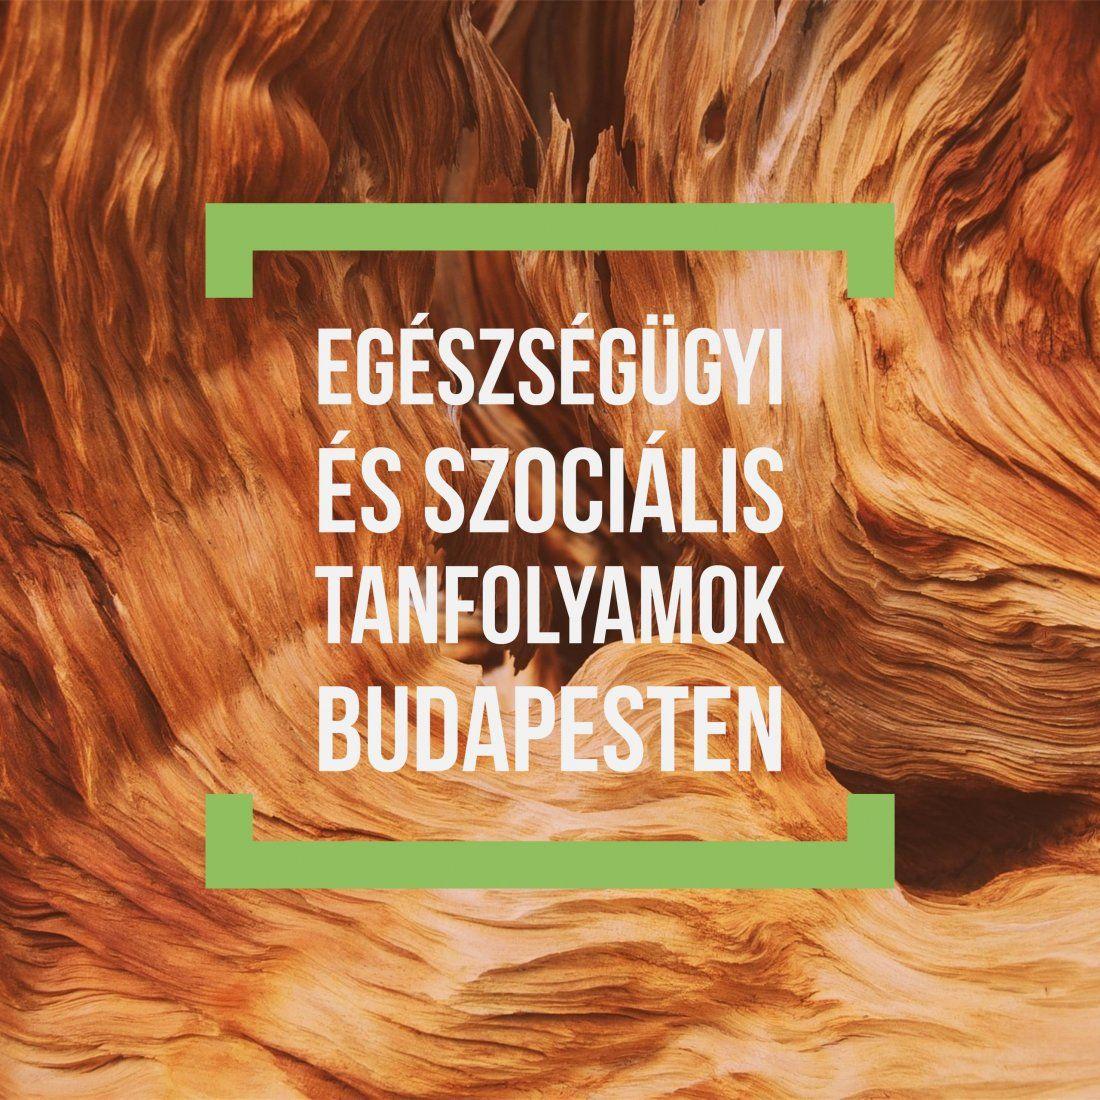 Pszicholgiai konzulens OKJ-n kvli tanfolyam Budapesten